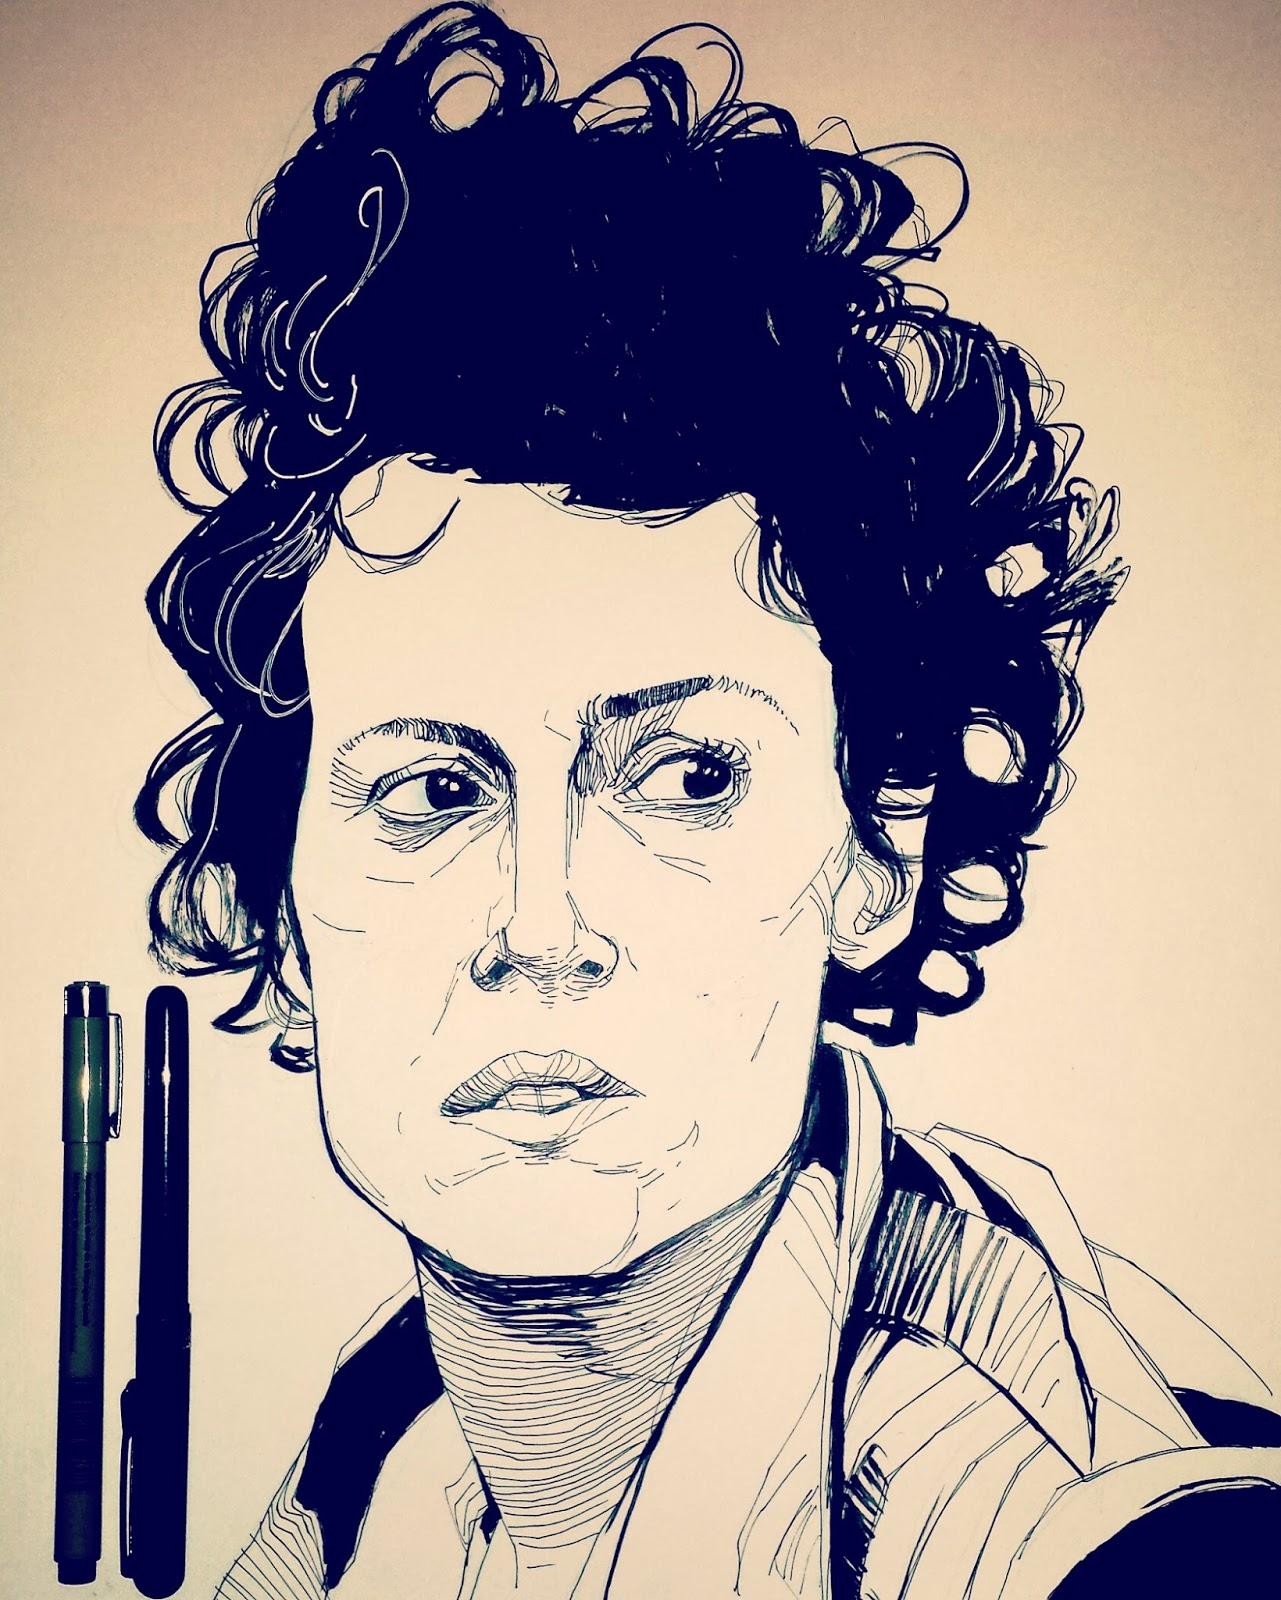 Ripley drawing Aliens